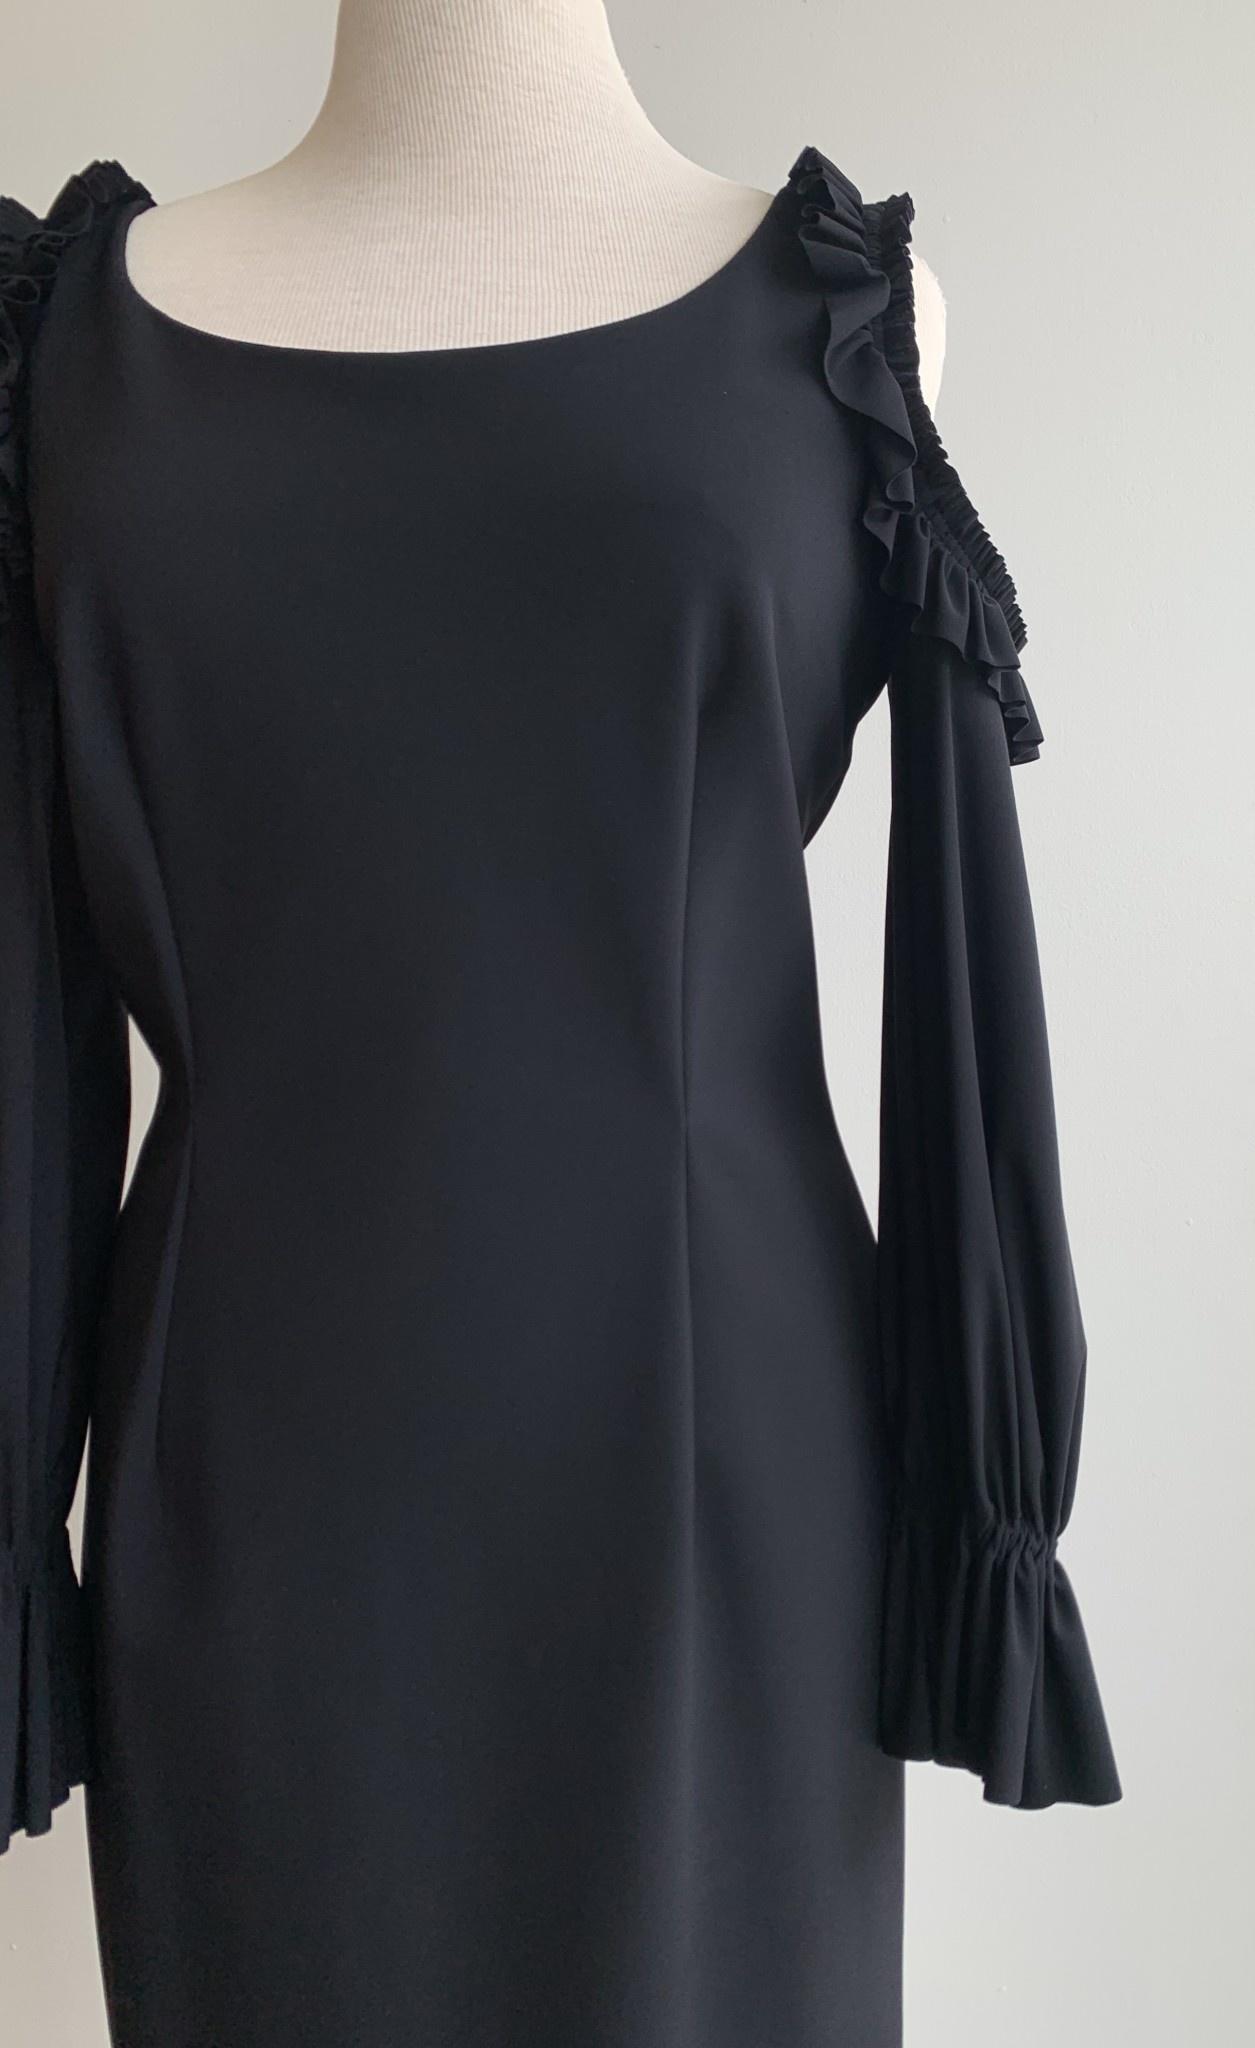 Greta Constantine Cold Shoulder Fitted Dress